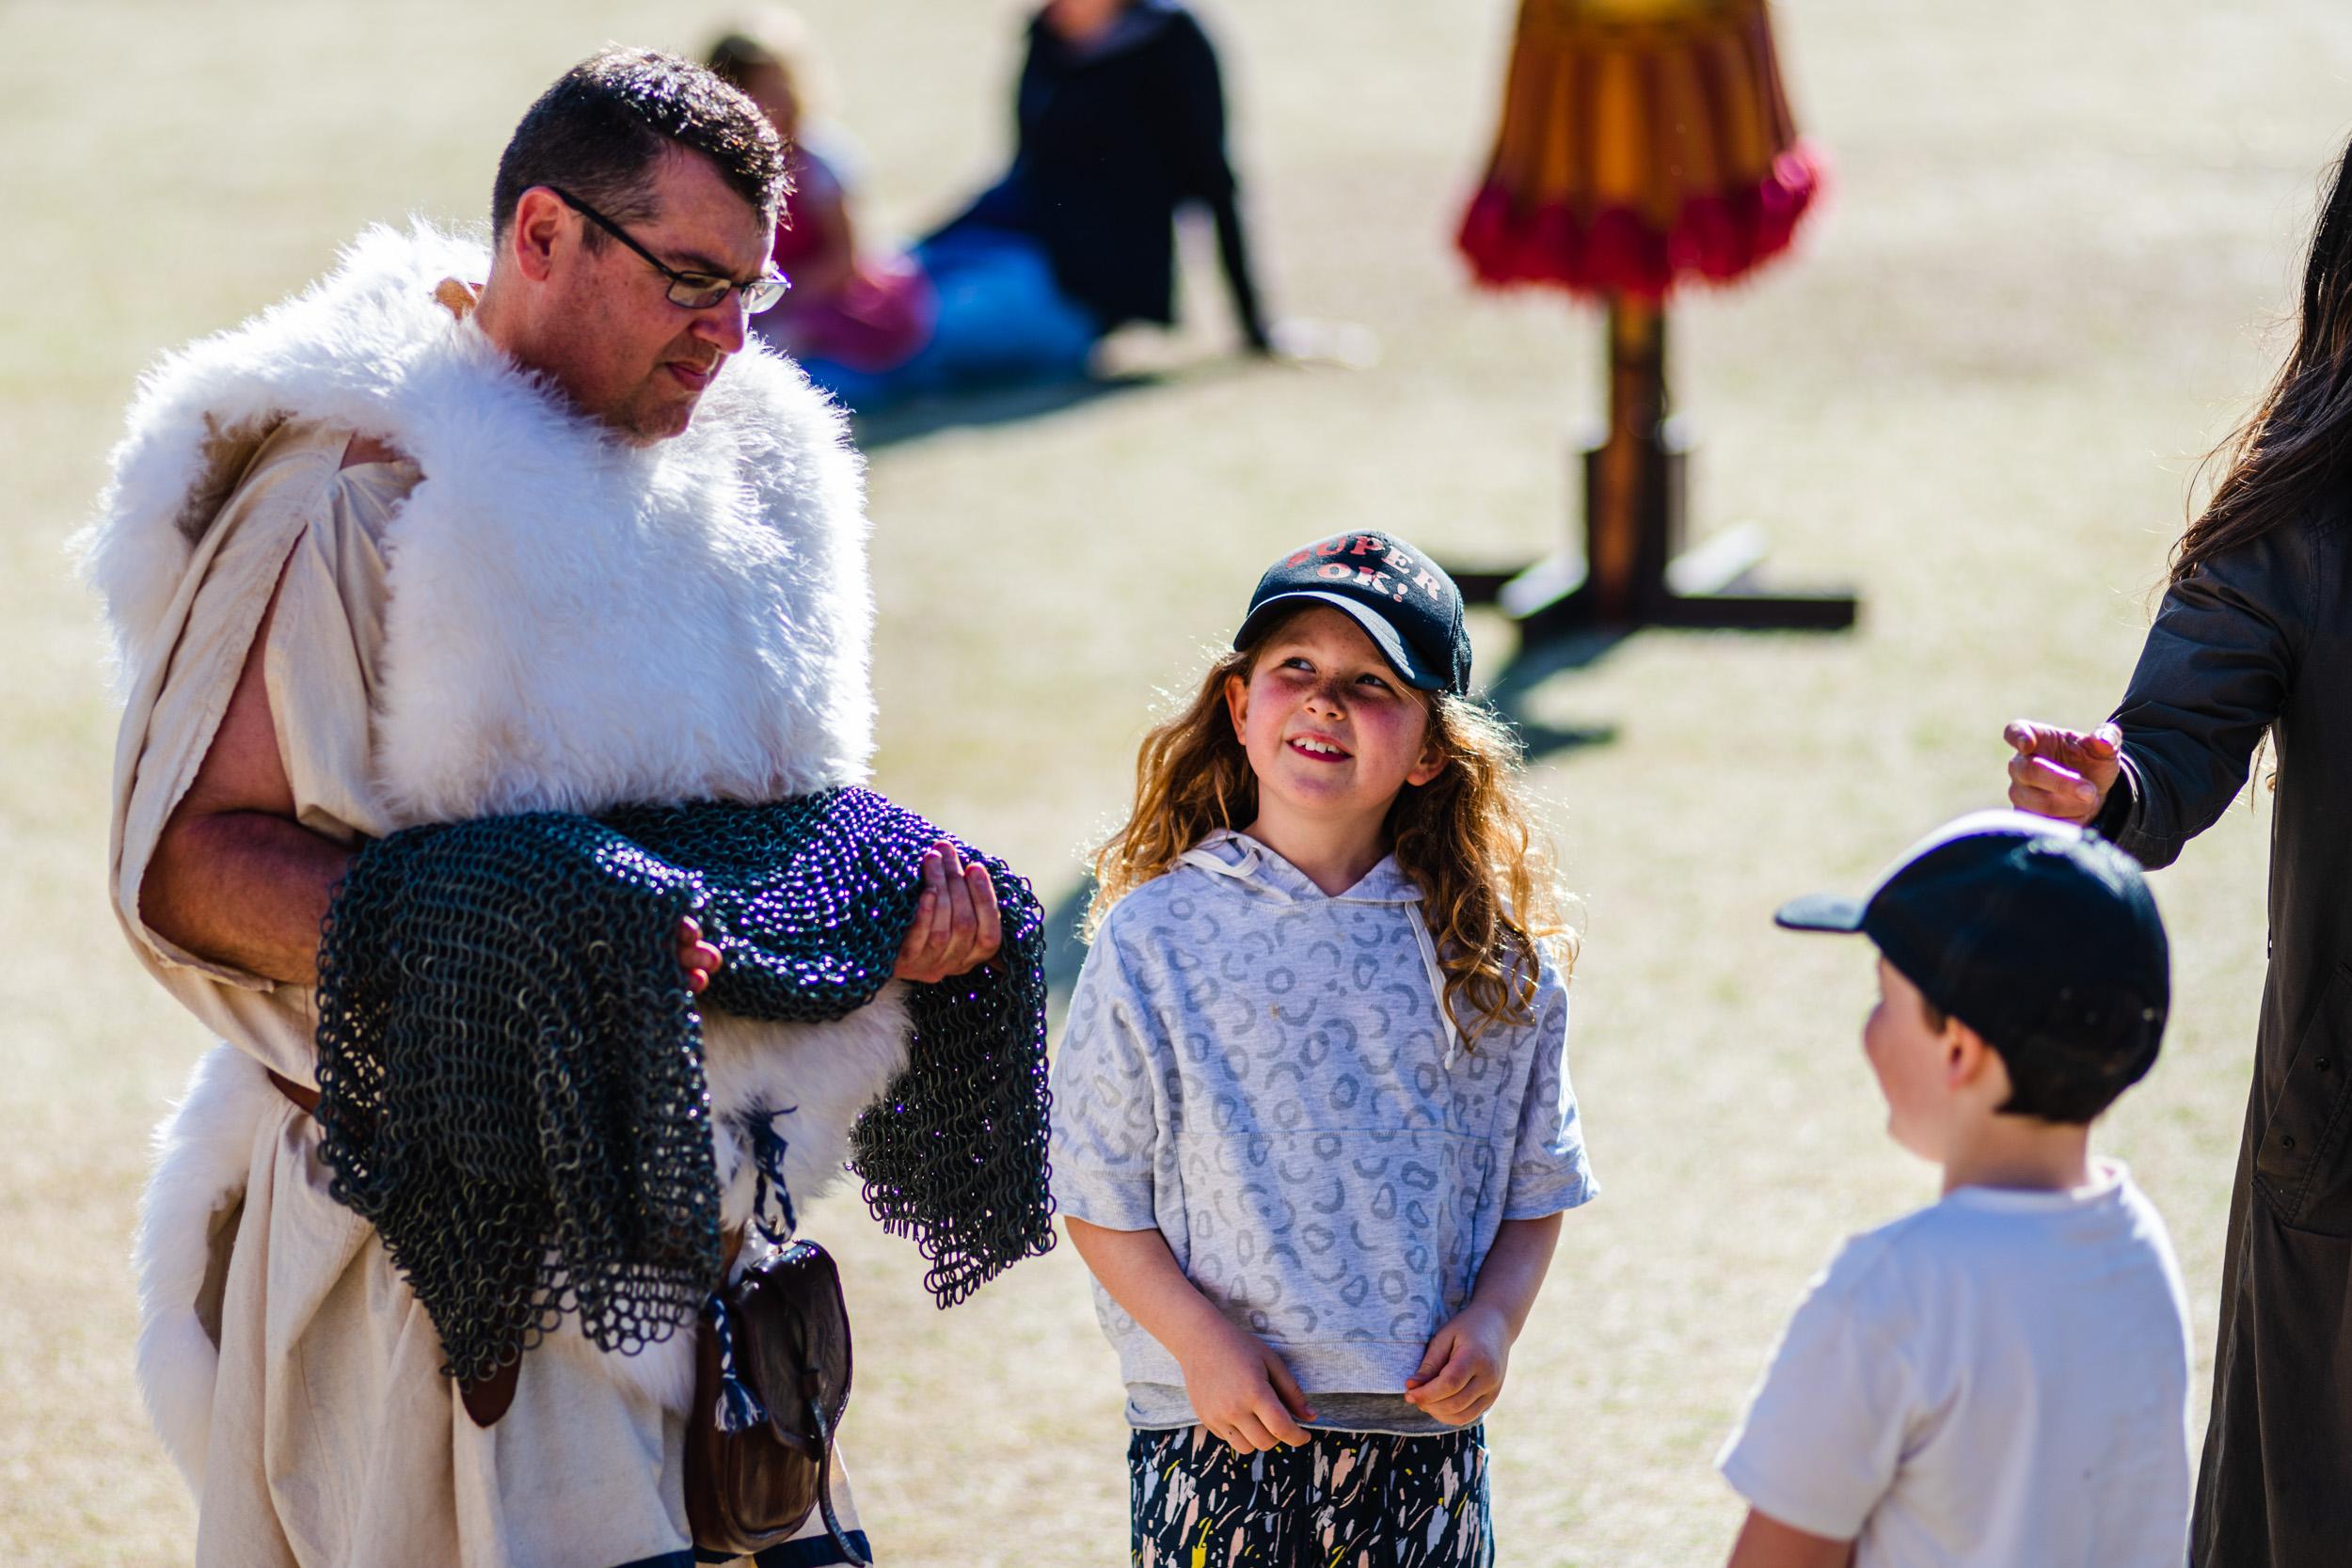 Spyrides_Kyle_Soul.Gazing.Photography_Medieval.Day_Reenactment.Group.Einherjar_Danelaw.Medieval.Fighting.Society_Petersham.Bowling.Club_18.8.2019DSC_0478.jpg